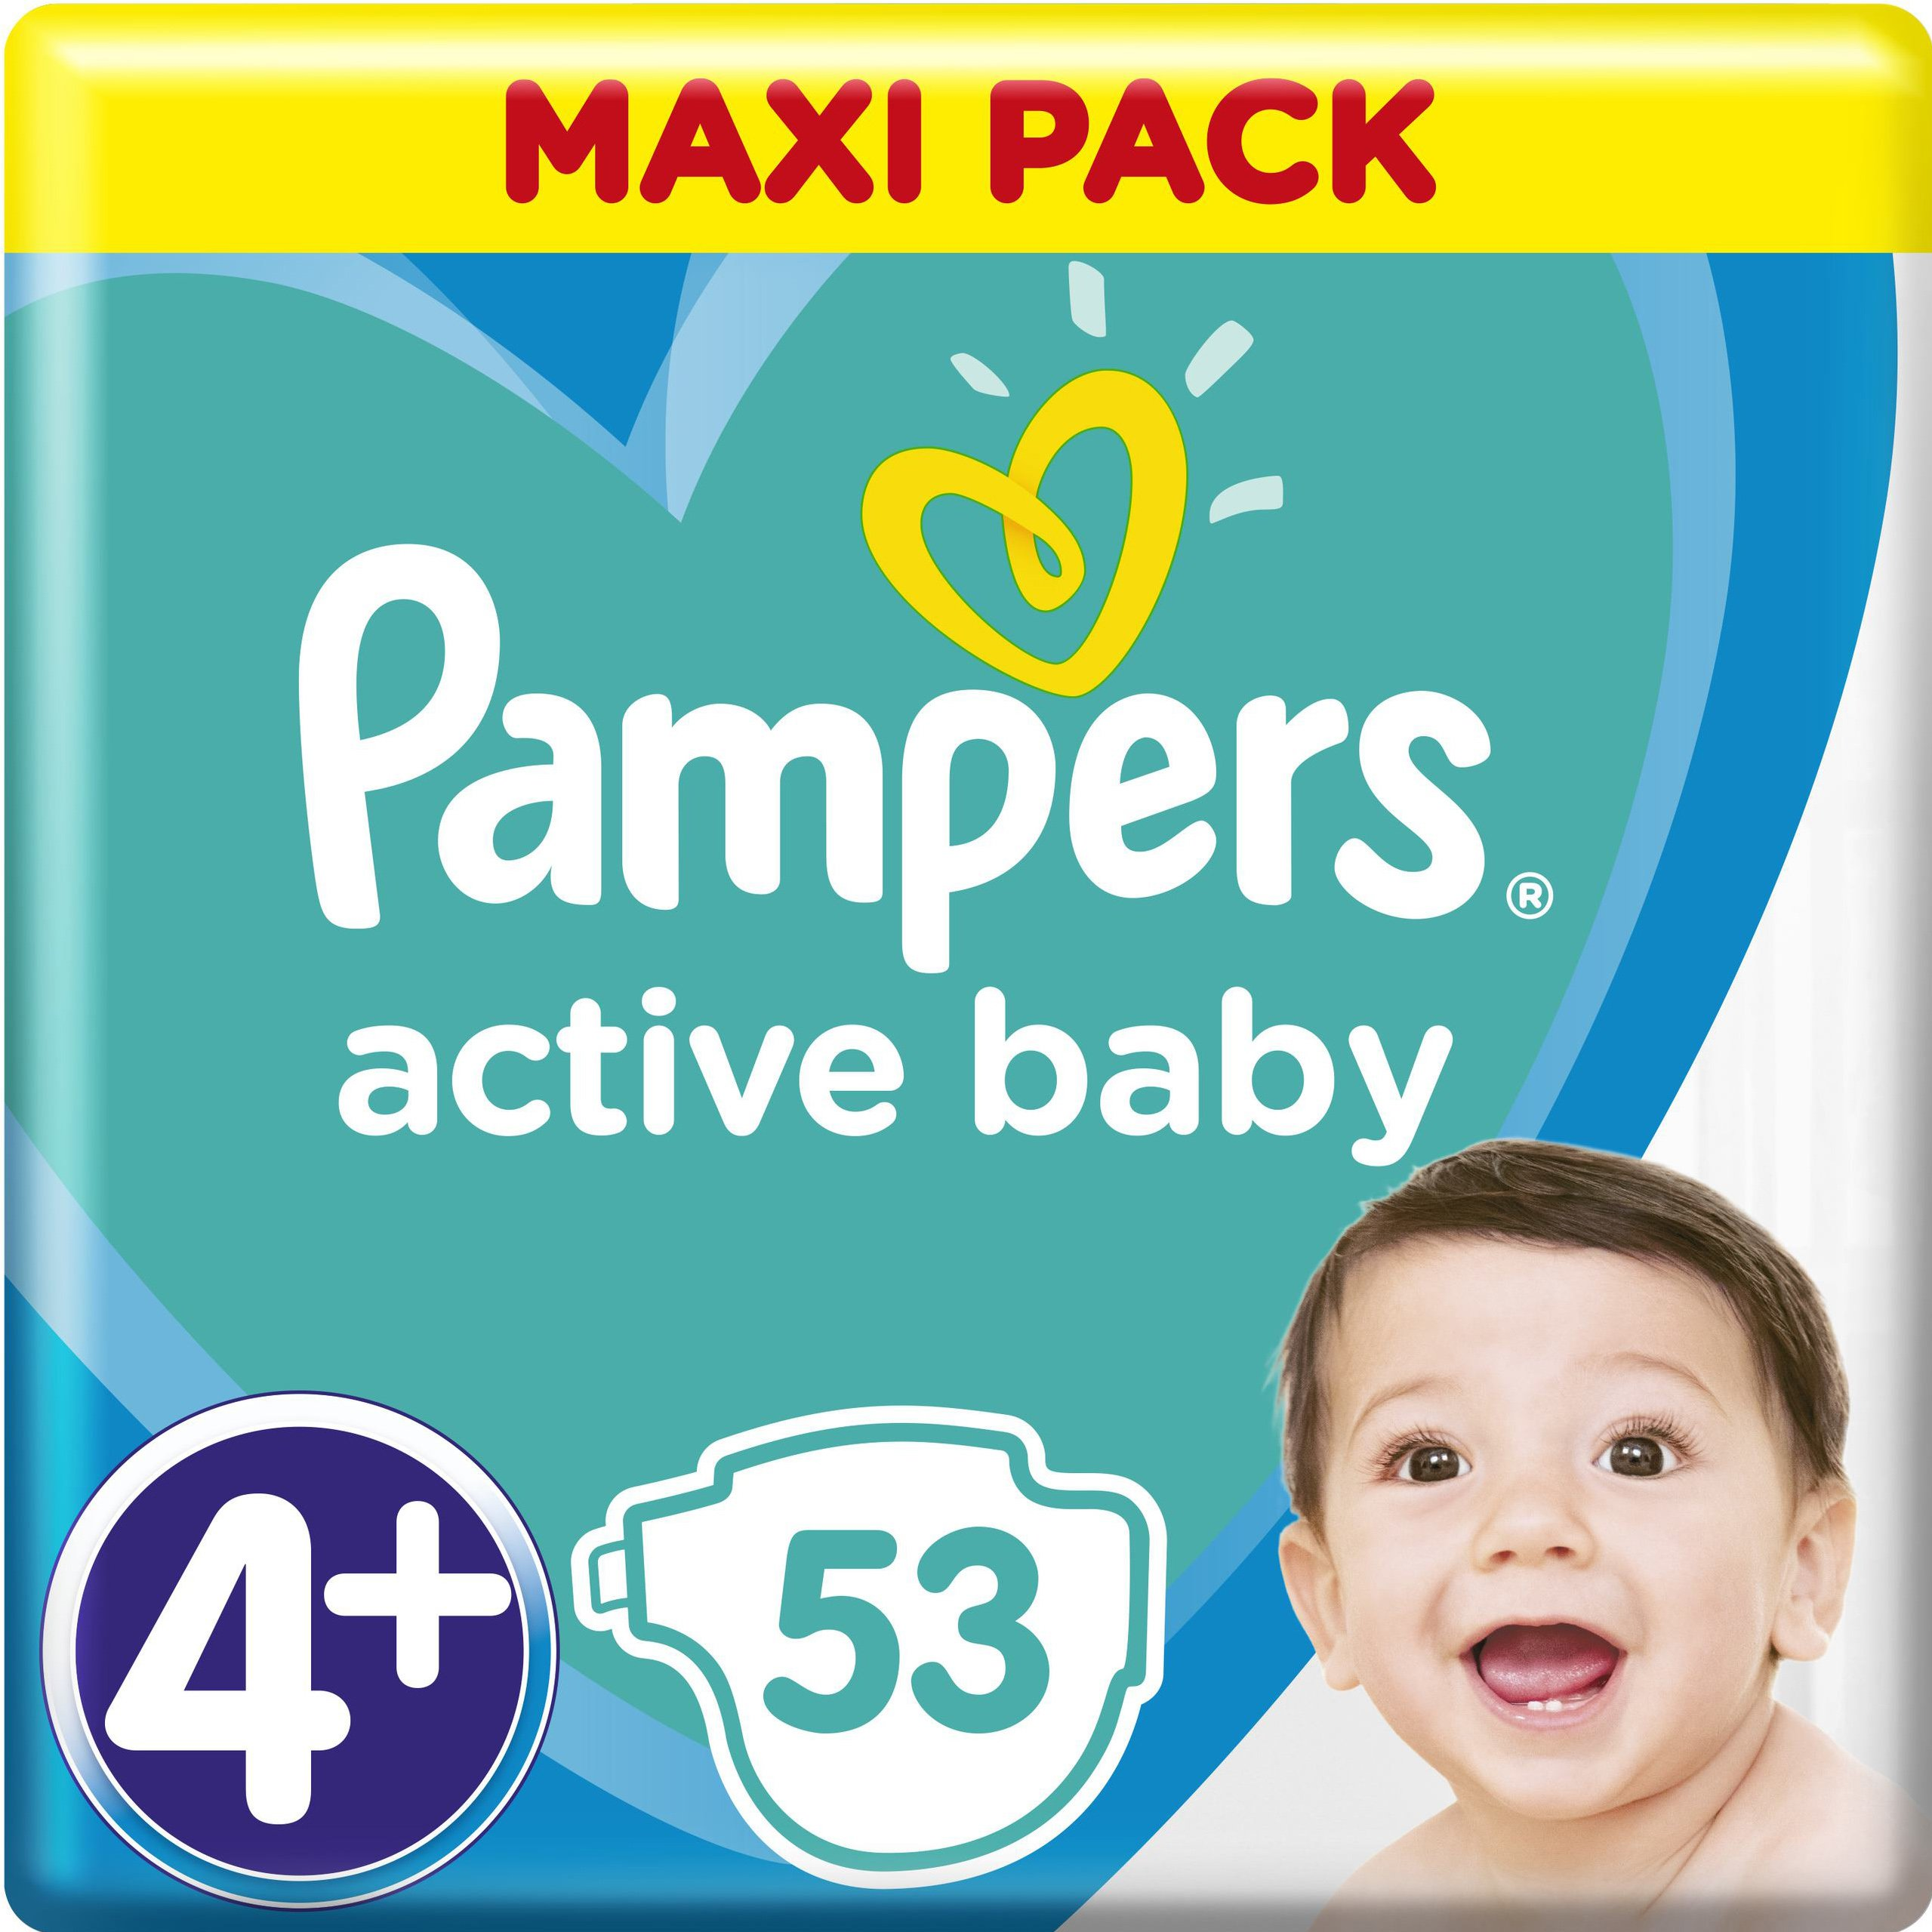 Pampers Active Baby Πάνες Maxi Pack No4+ (10-15 kg), 53 Πάνες μητέρα παιδί   περιποίηση για το μωρό   πάνες για το μωρό